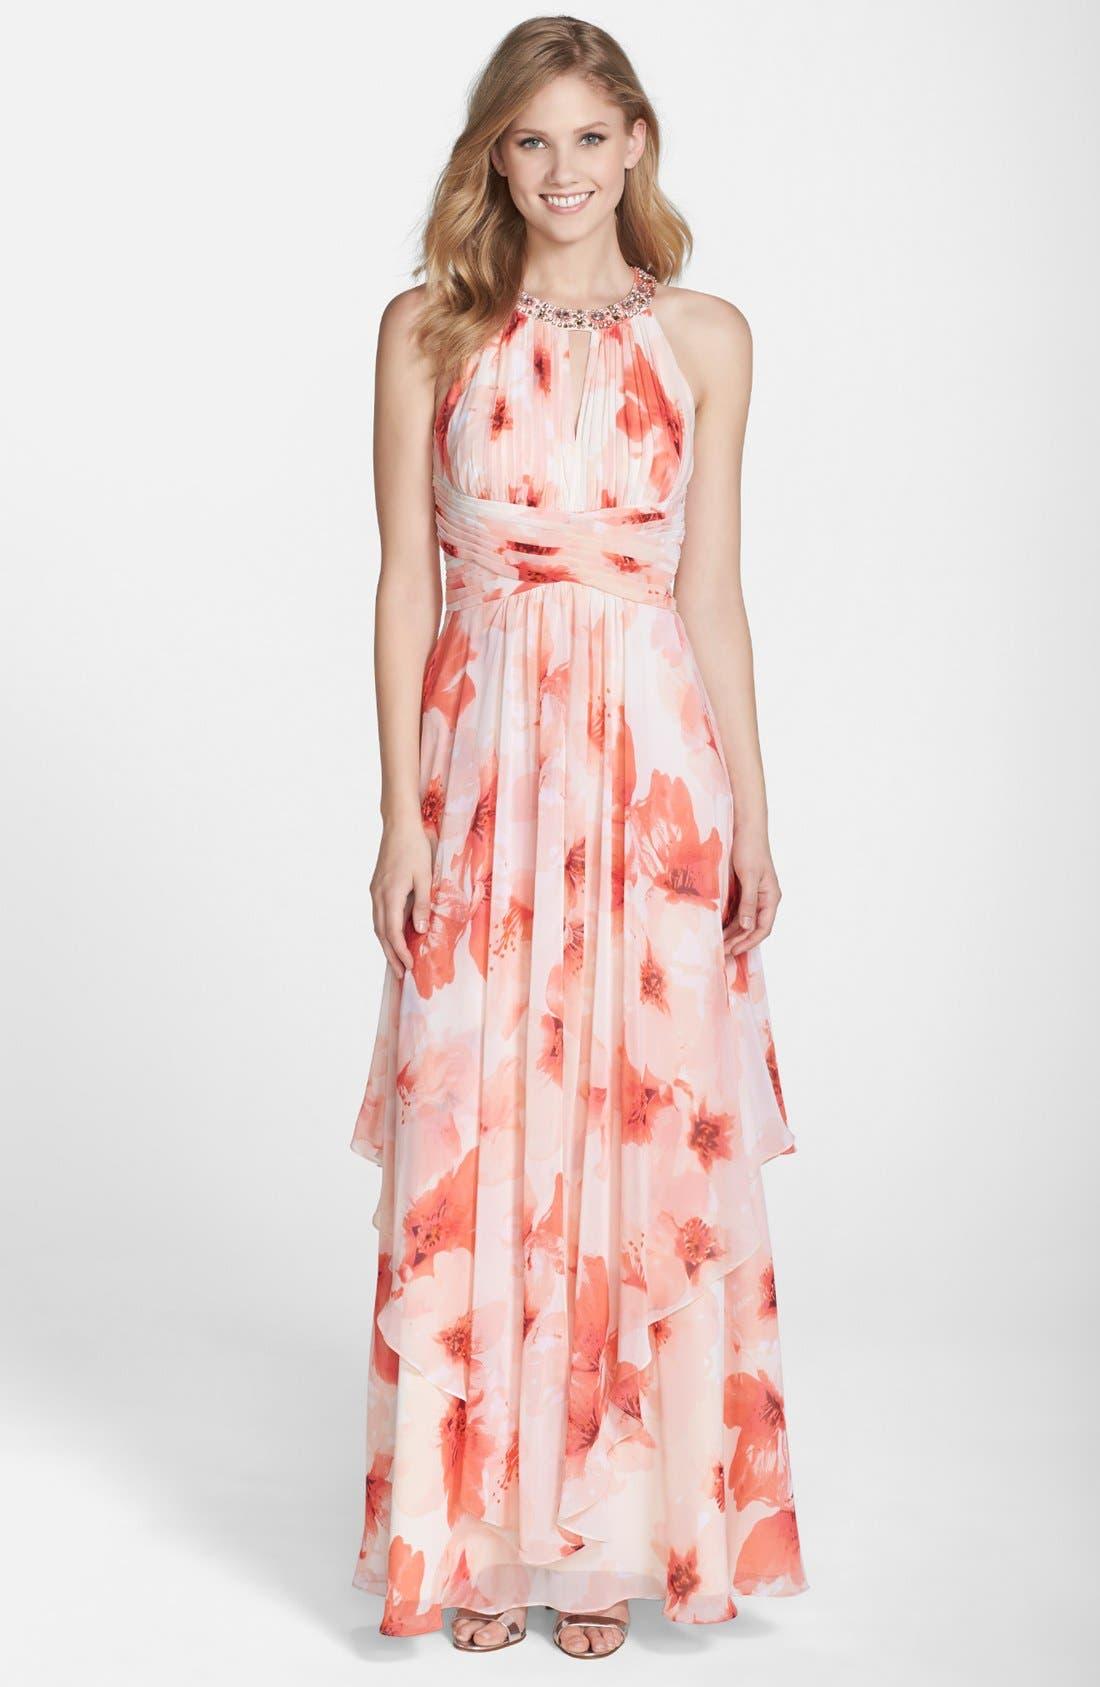 Alternate Image 1 Selected - Eliza J Embellished Floral Print Chiffon Gown (Regular & Petite)